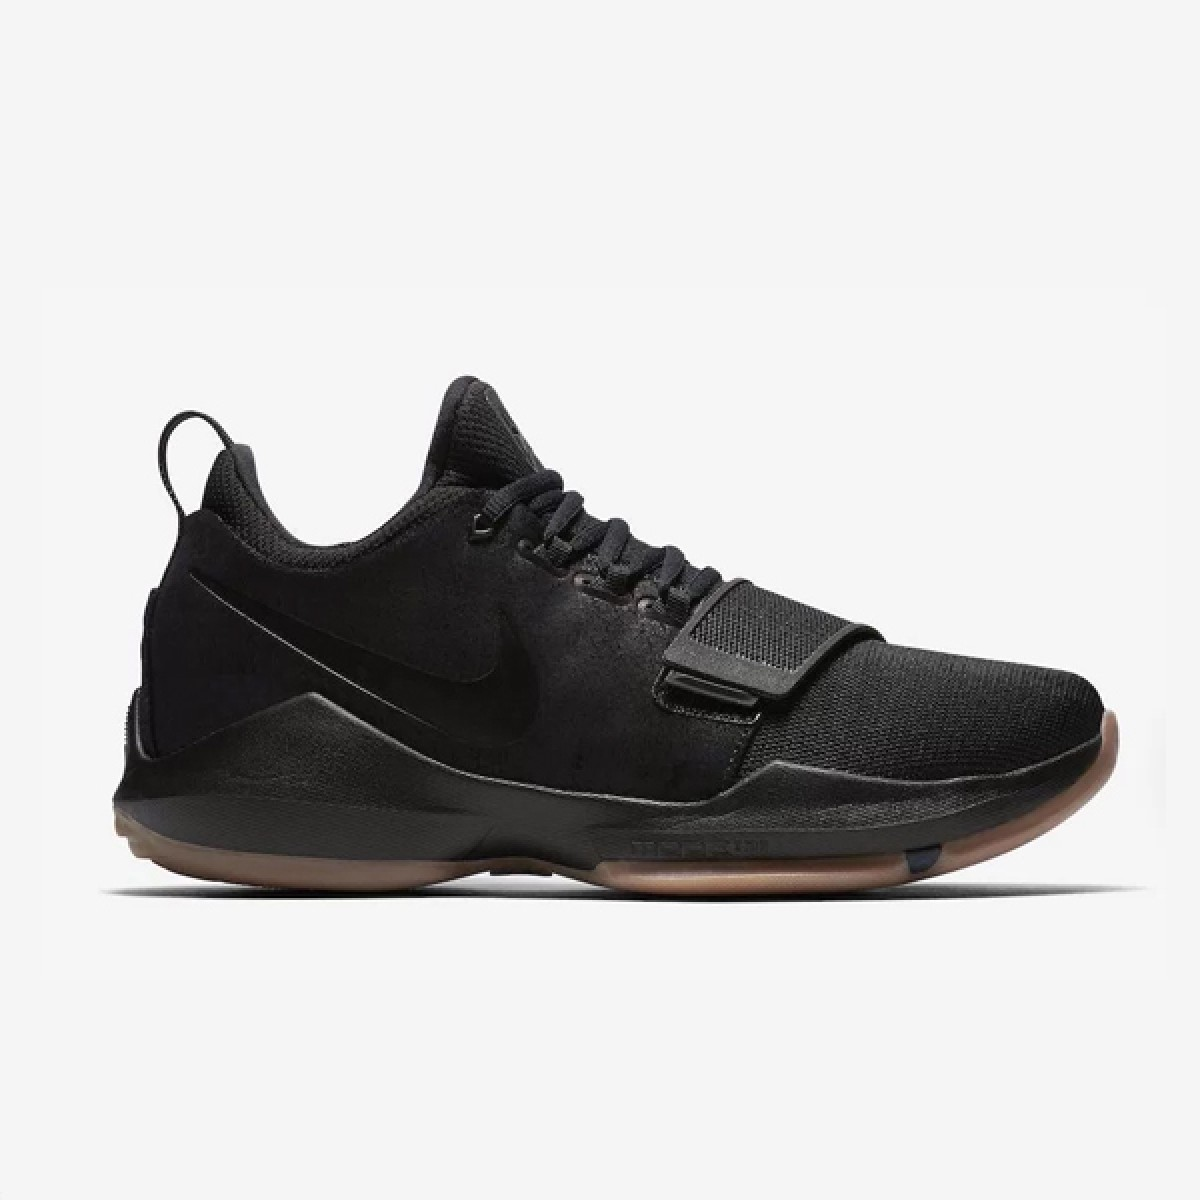 Nike PG 1 'Black Gum'